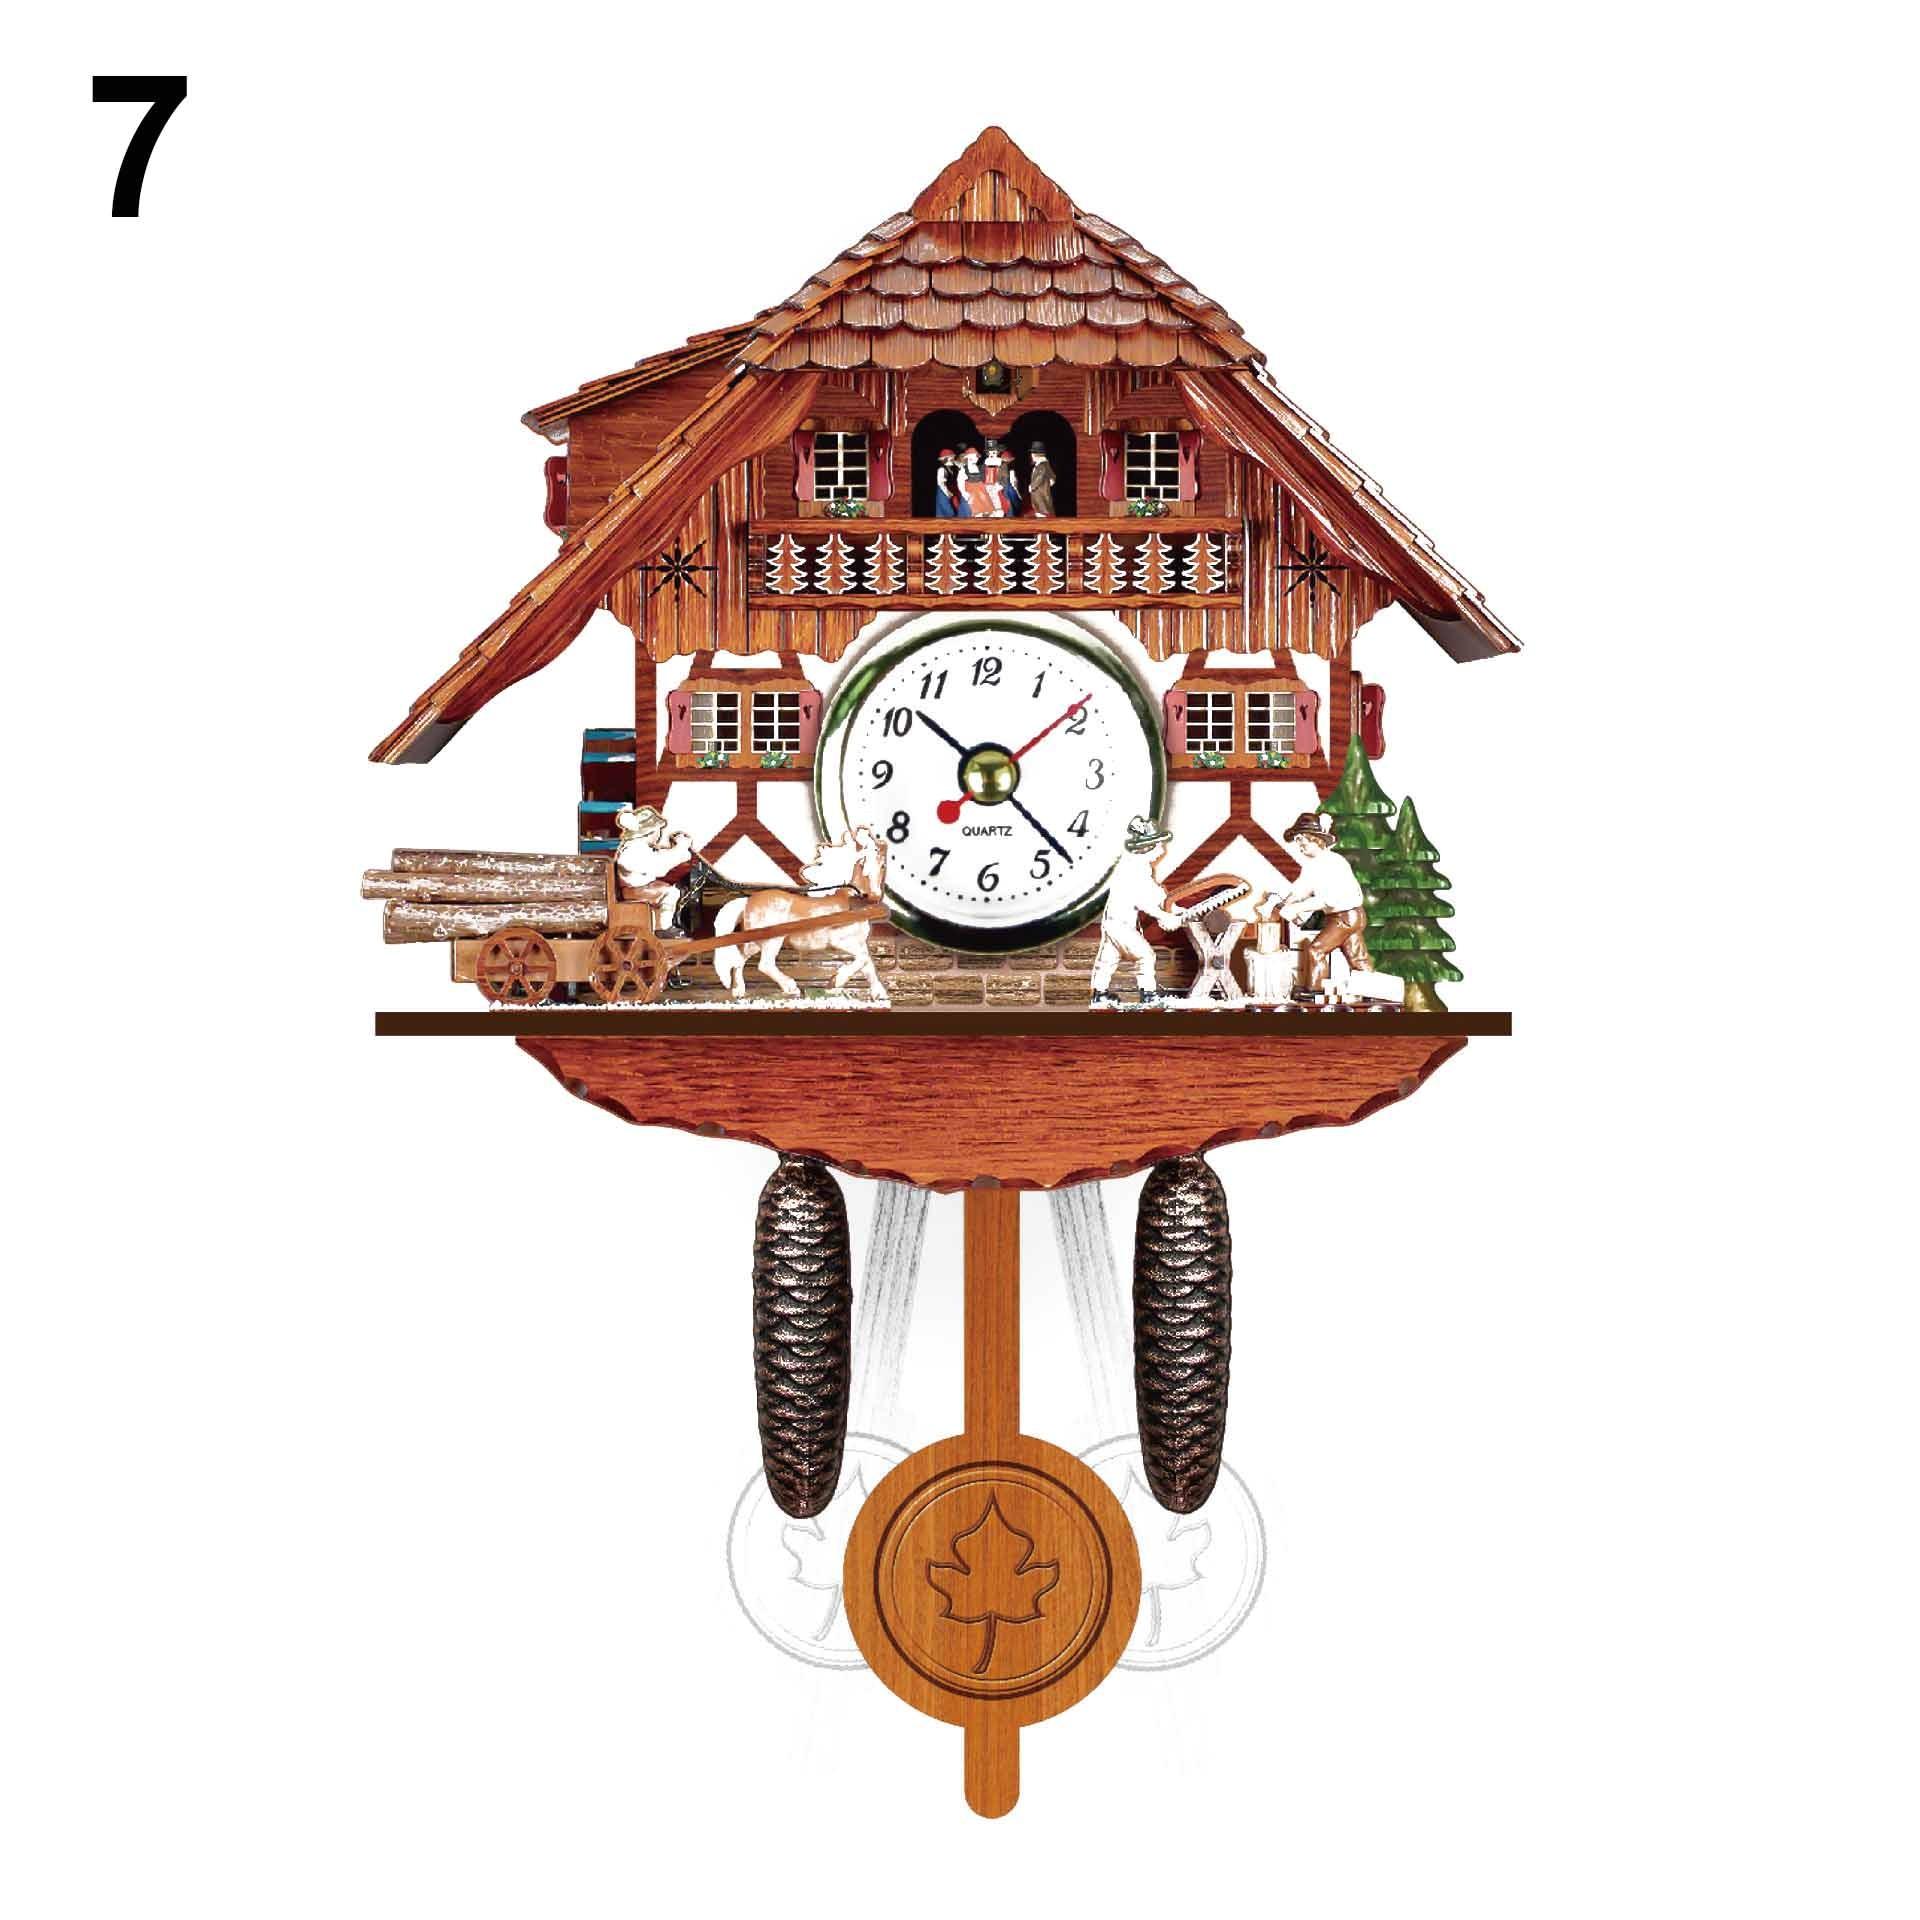 hot new wall clock antique wooden cuckoo bird time bell swing alarm watch home art decor xh8z jy20 in wall clocks from home garden on aliexpress com